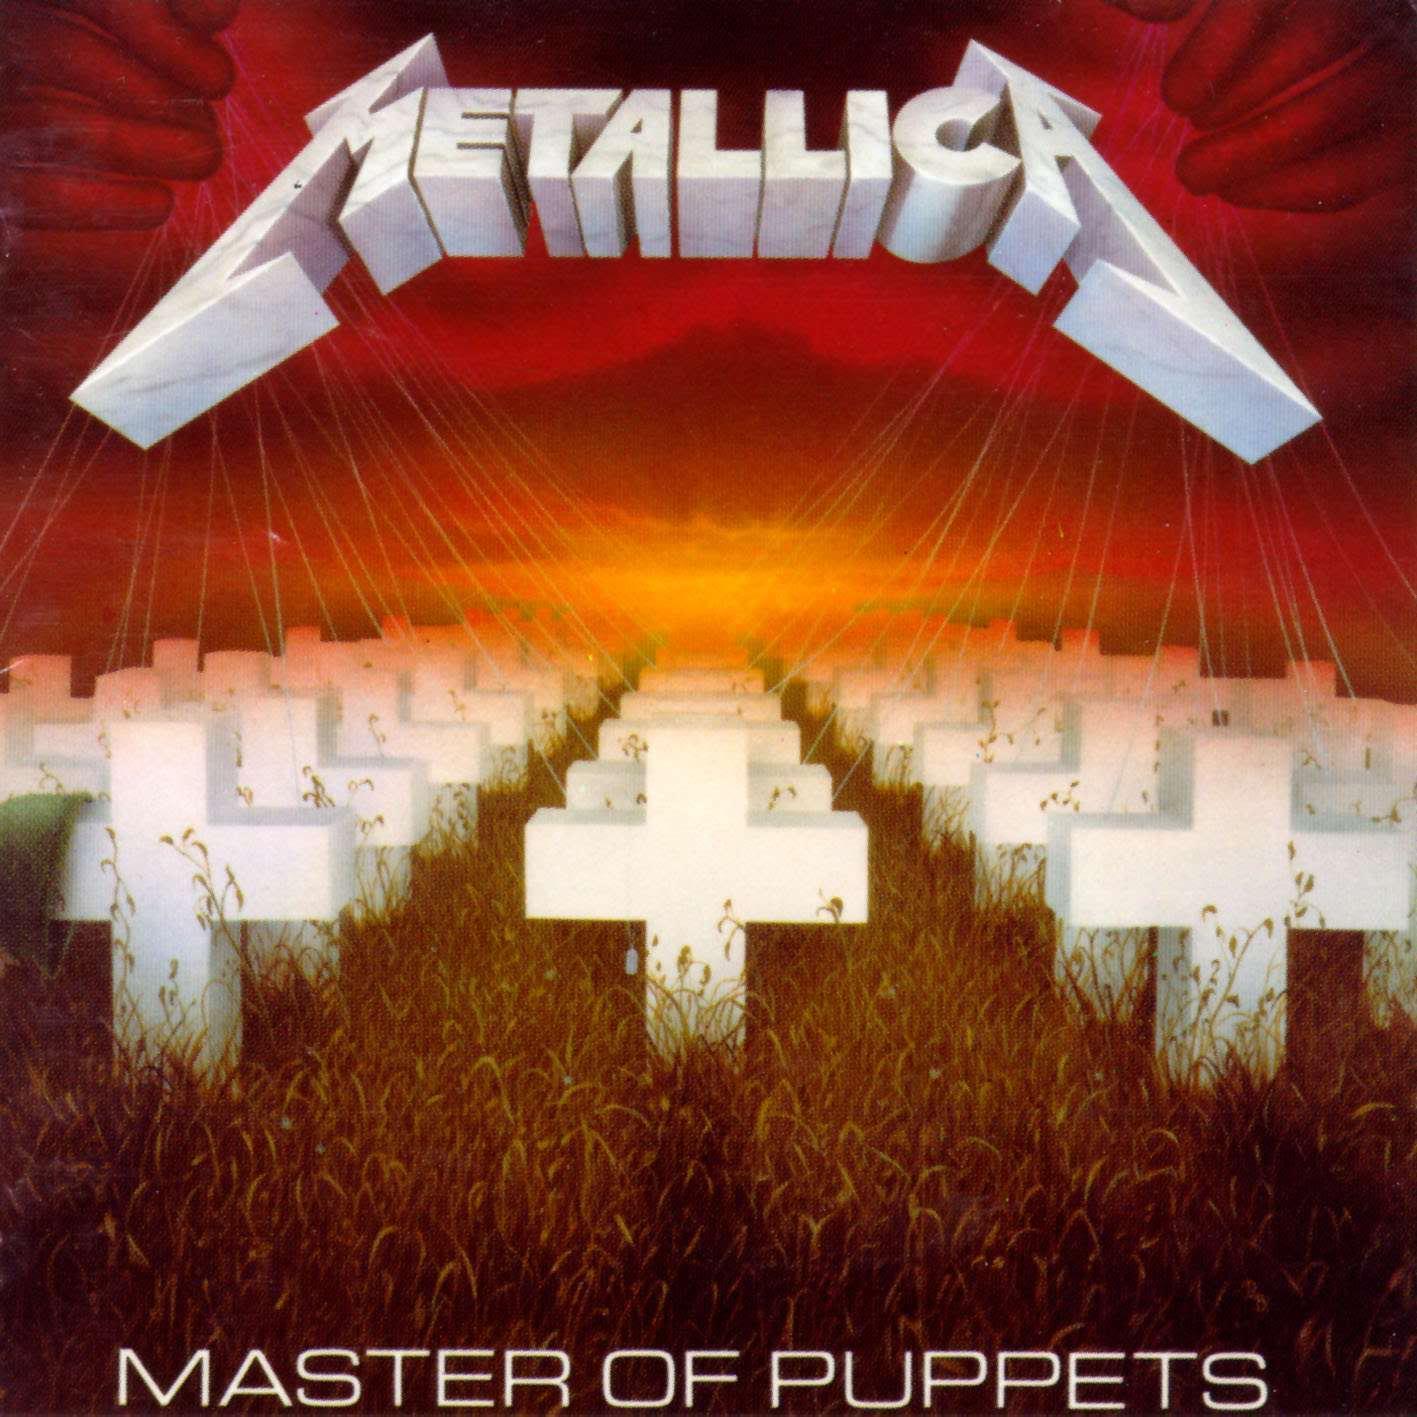 [MegaPost] Discografía de Metallica sin descargar